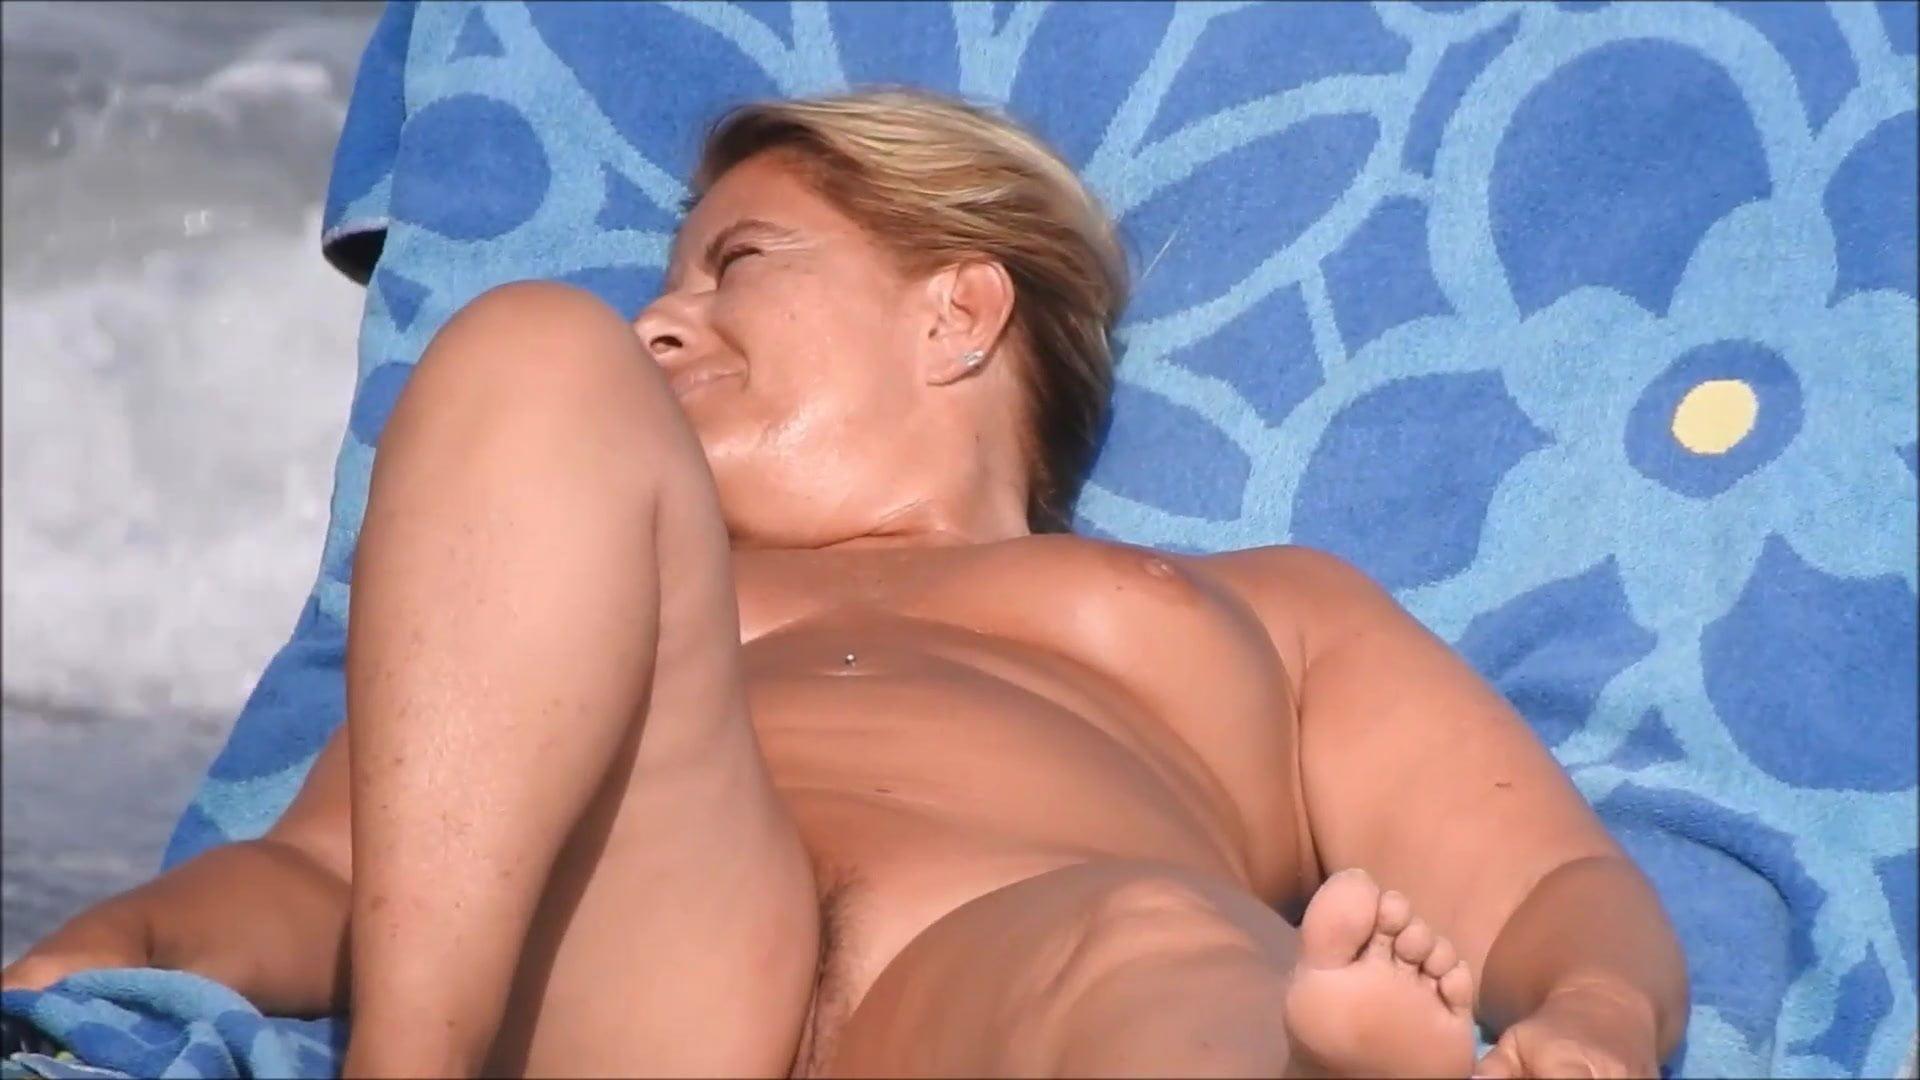 Big booty tit fucking pov sexy sport